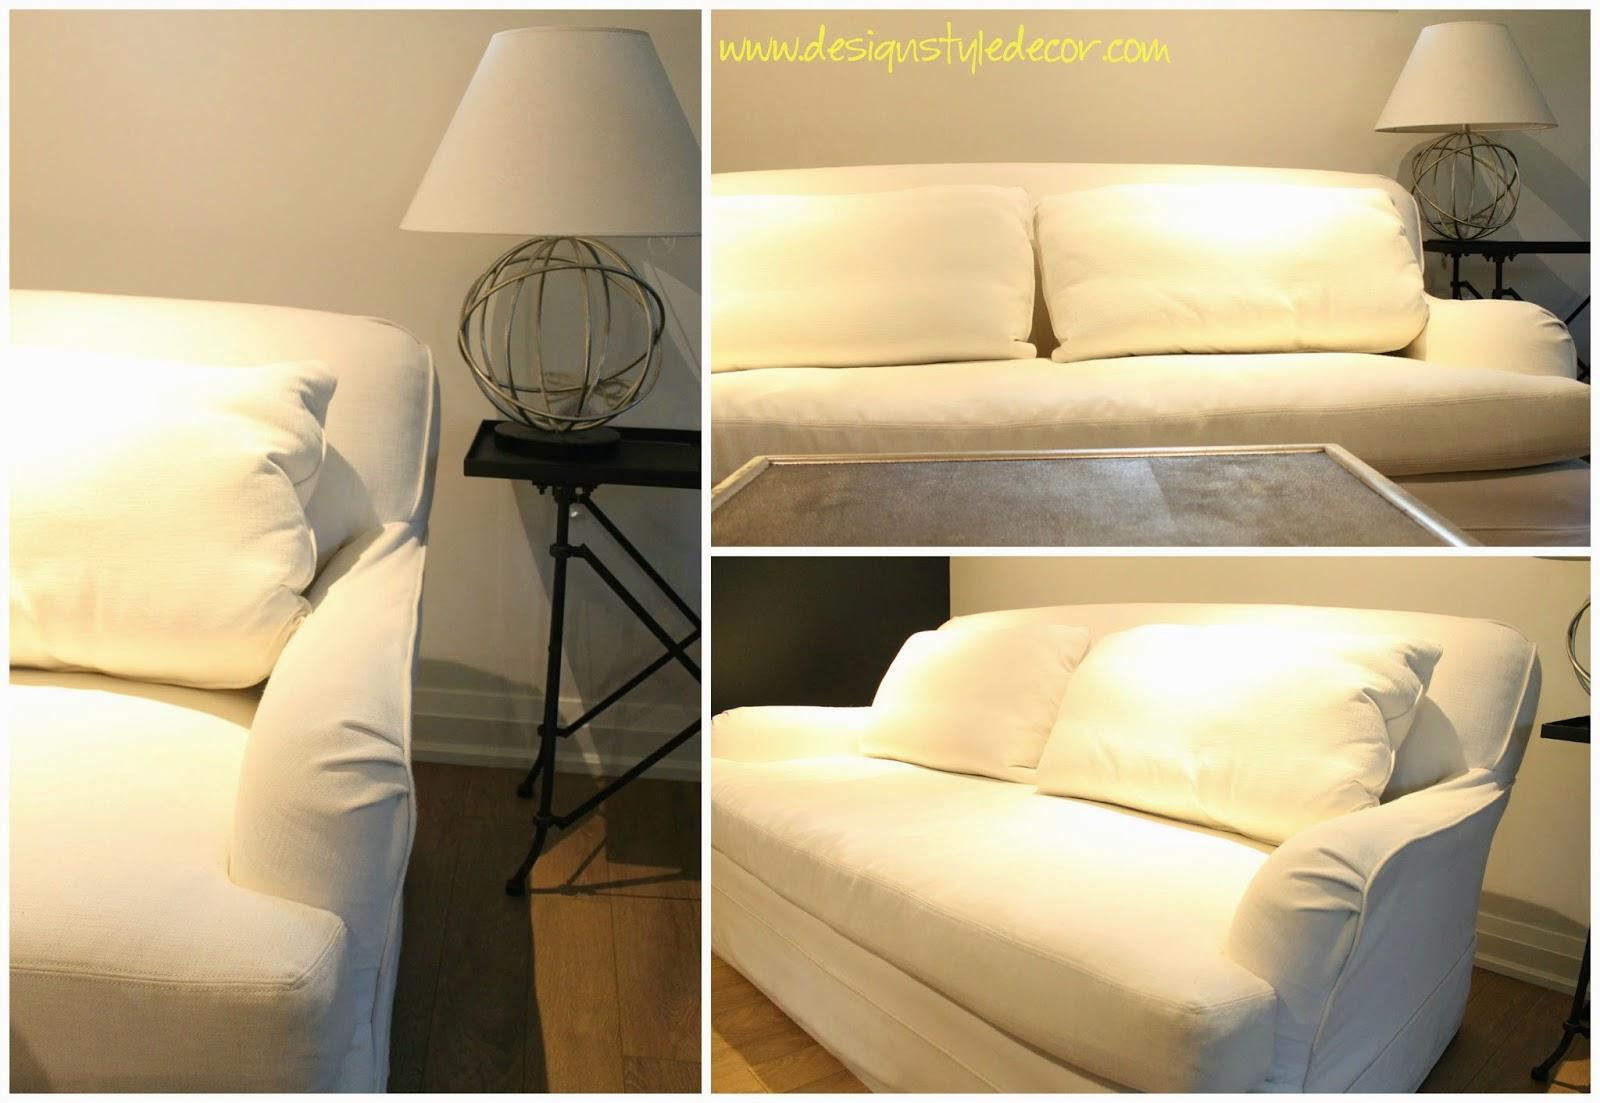 7ft Sofa Cover Batman Chair And Ottoman Set Design Style Decor Find